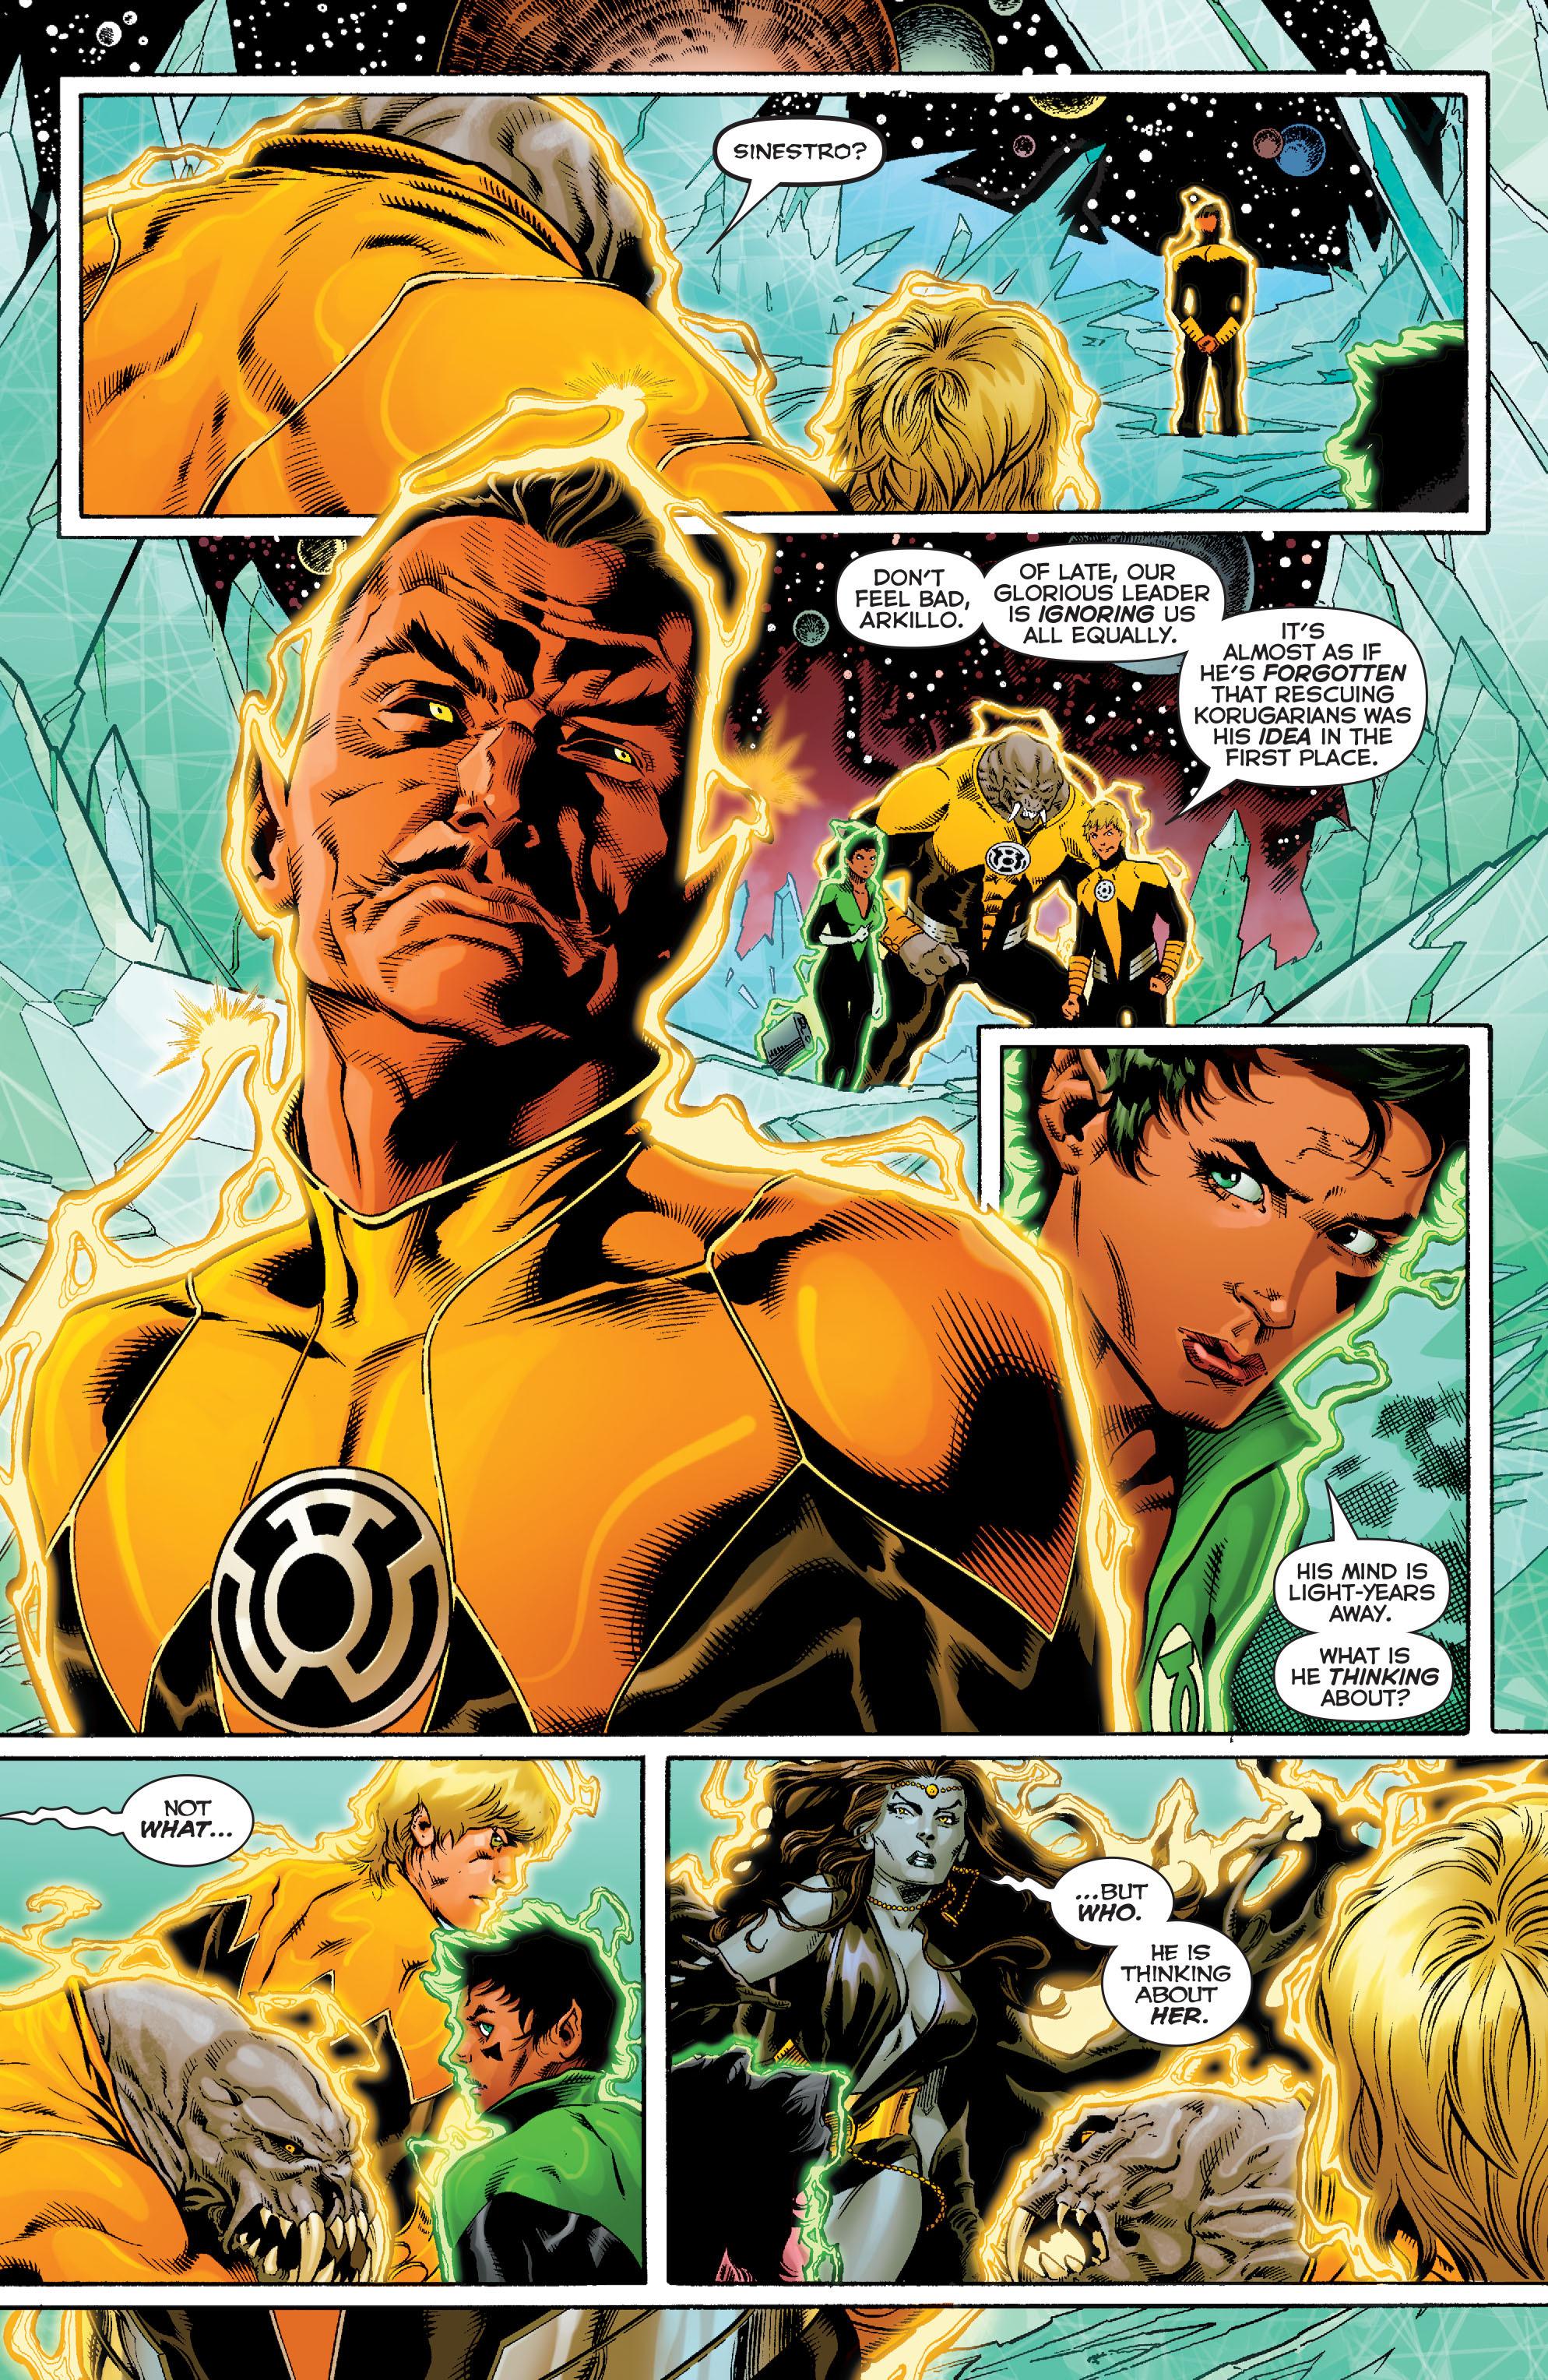 Read online Sinestro comic -  Issue #9 - 6